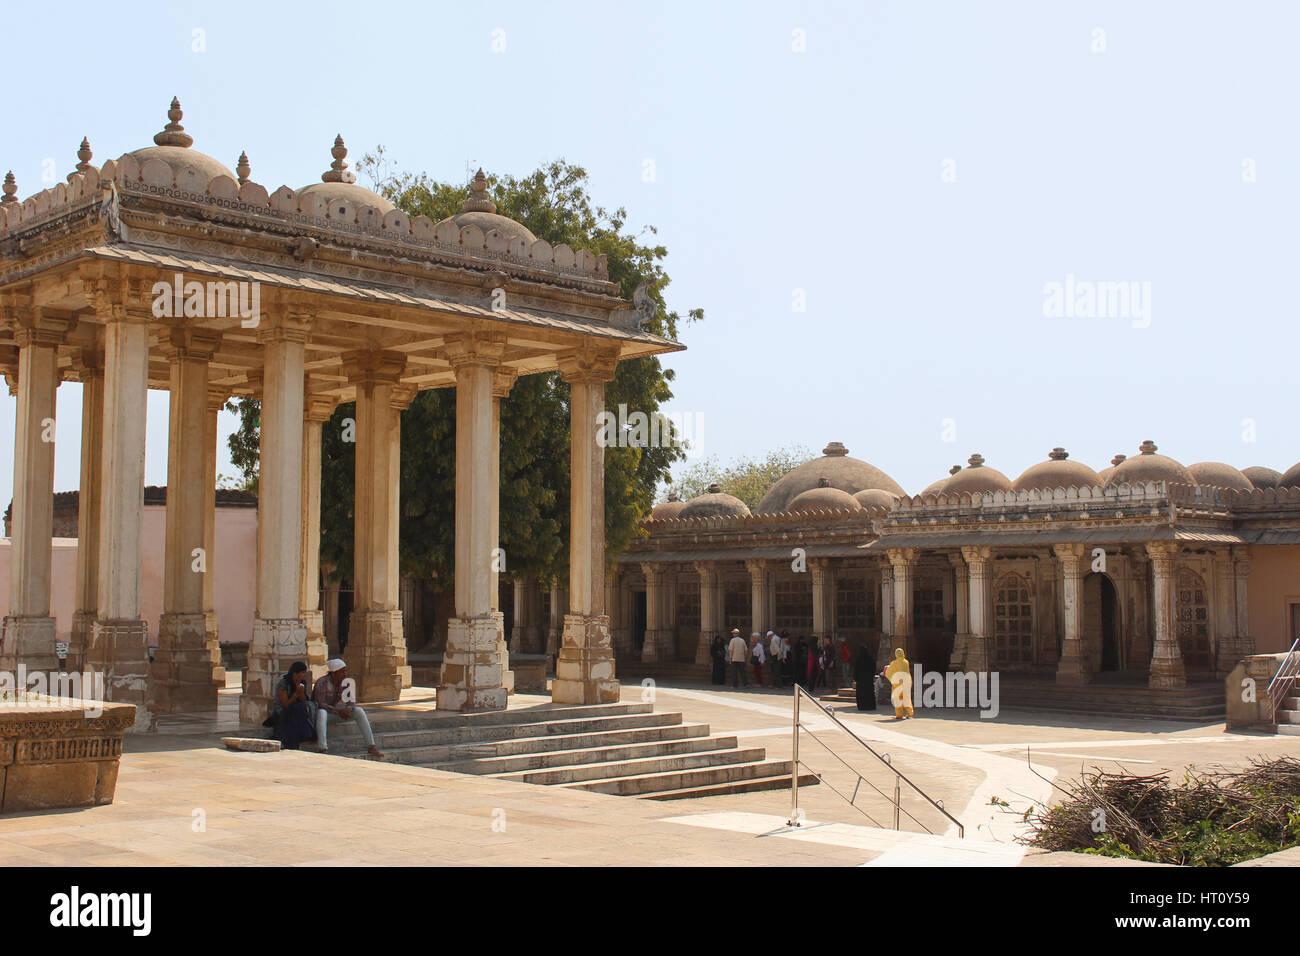 View of Bardari and the east mausoleum. Sarkhej Roza, Ahmedabad, Gujarat India. Contains the tombs of Mahmud Begada, - Stock Image